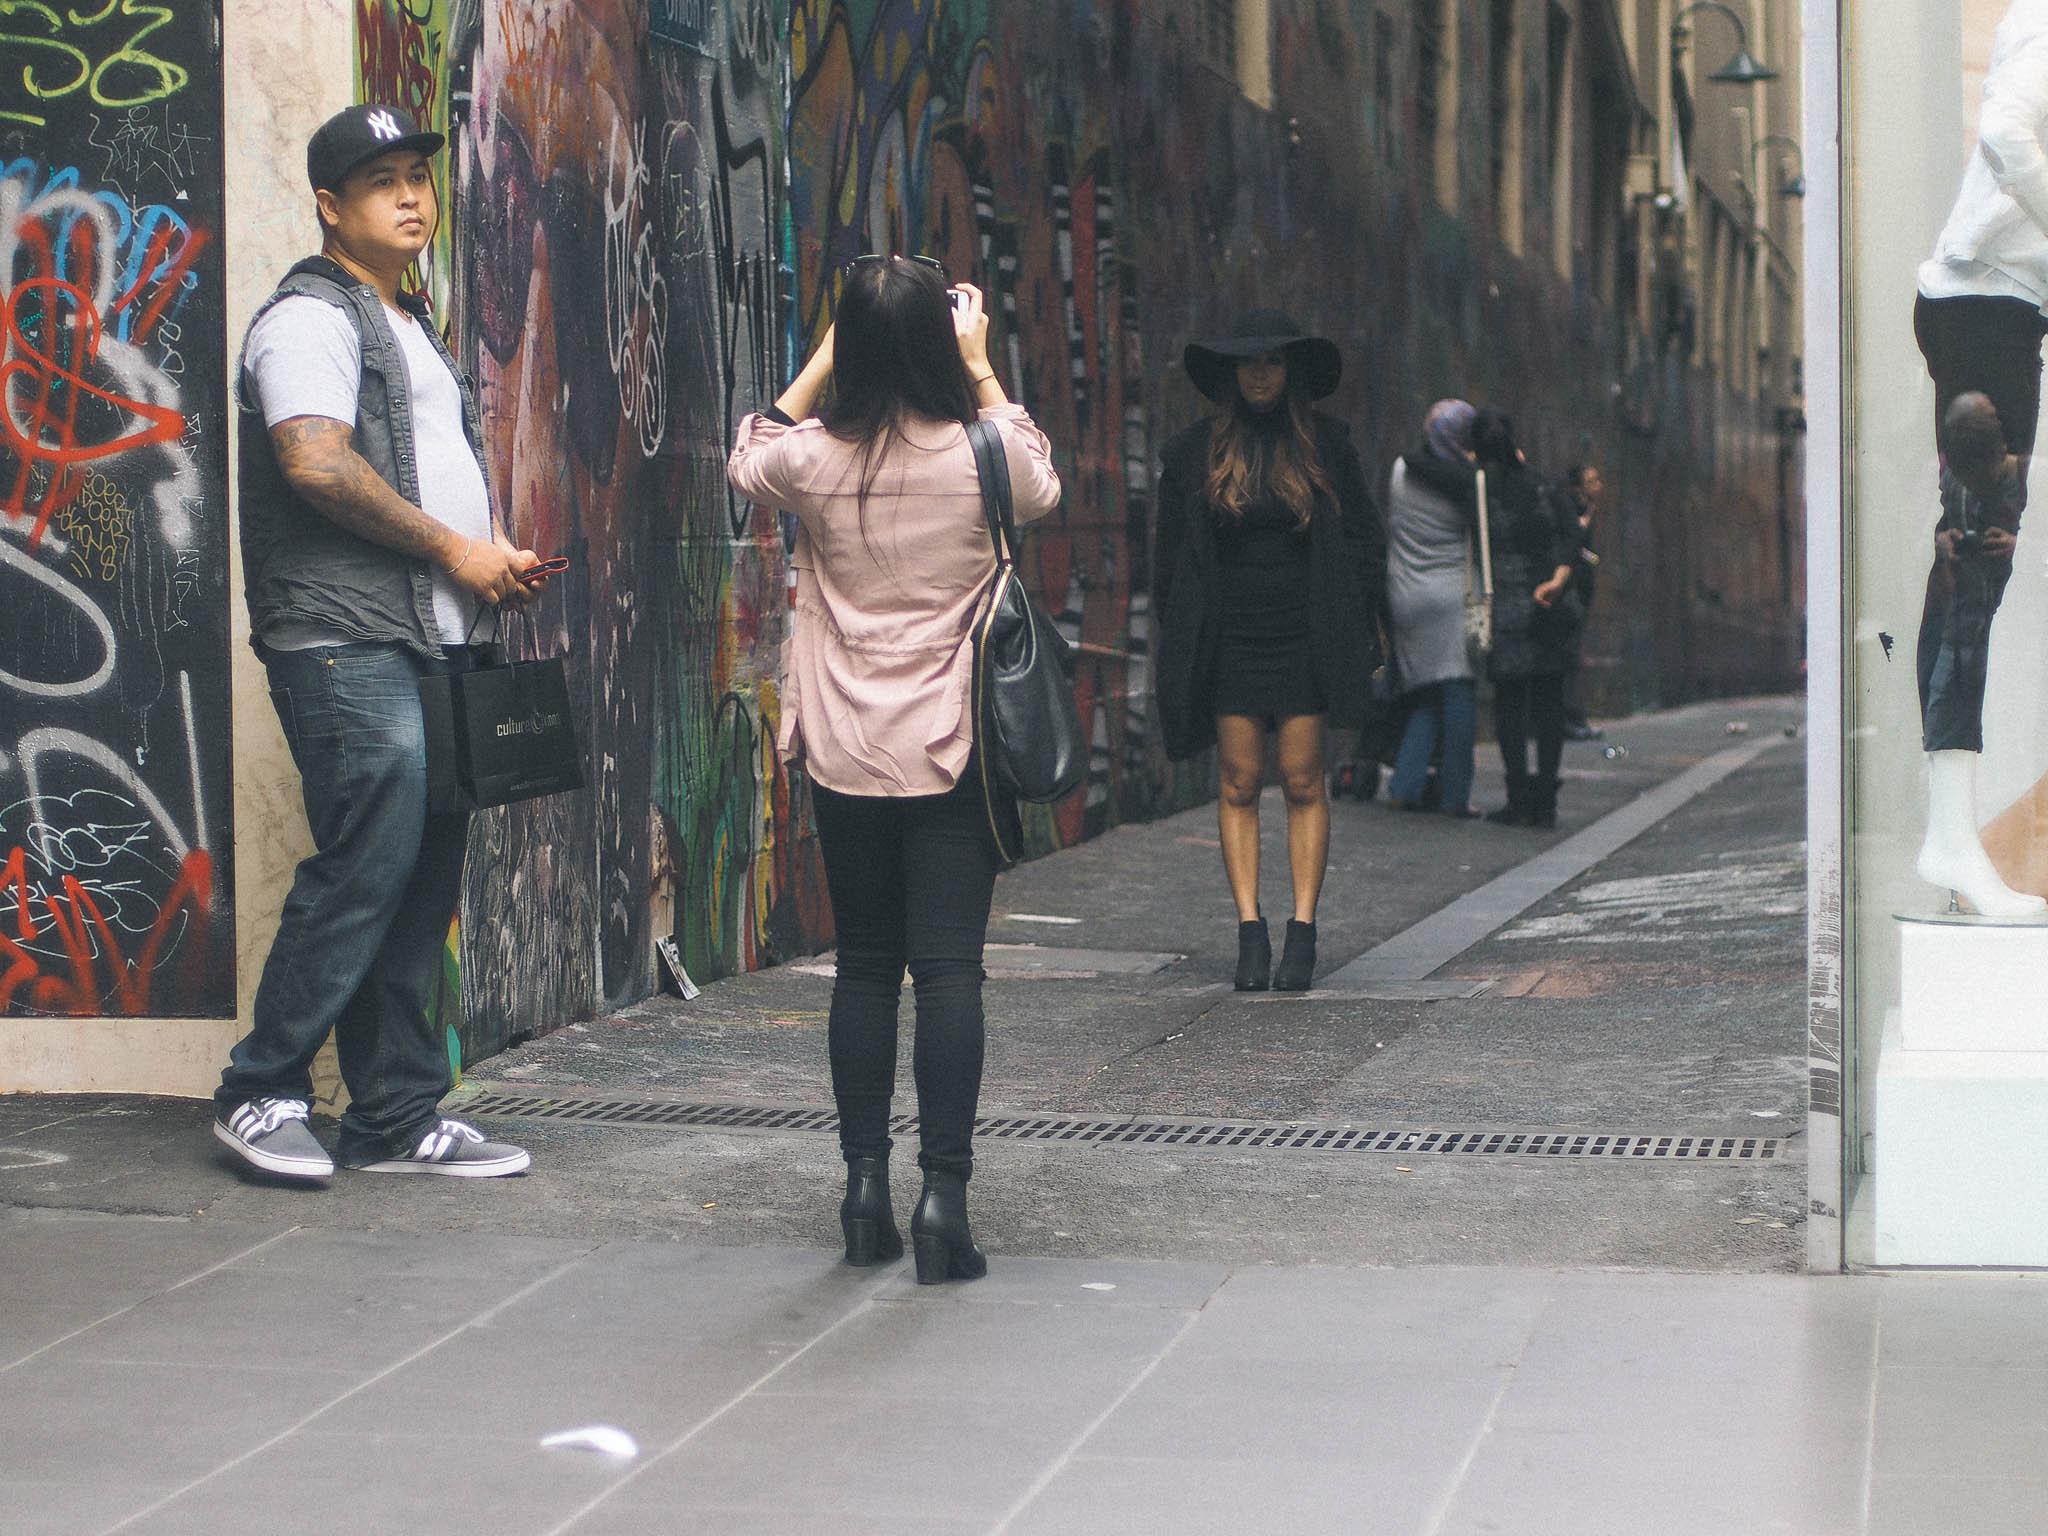 201508_Melbourne-149.jpg